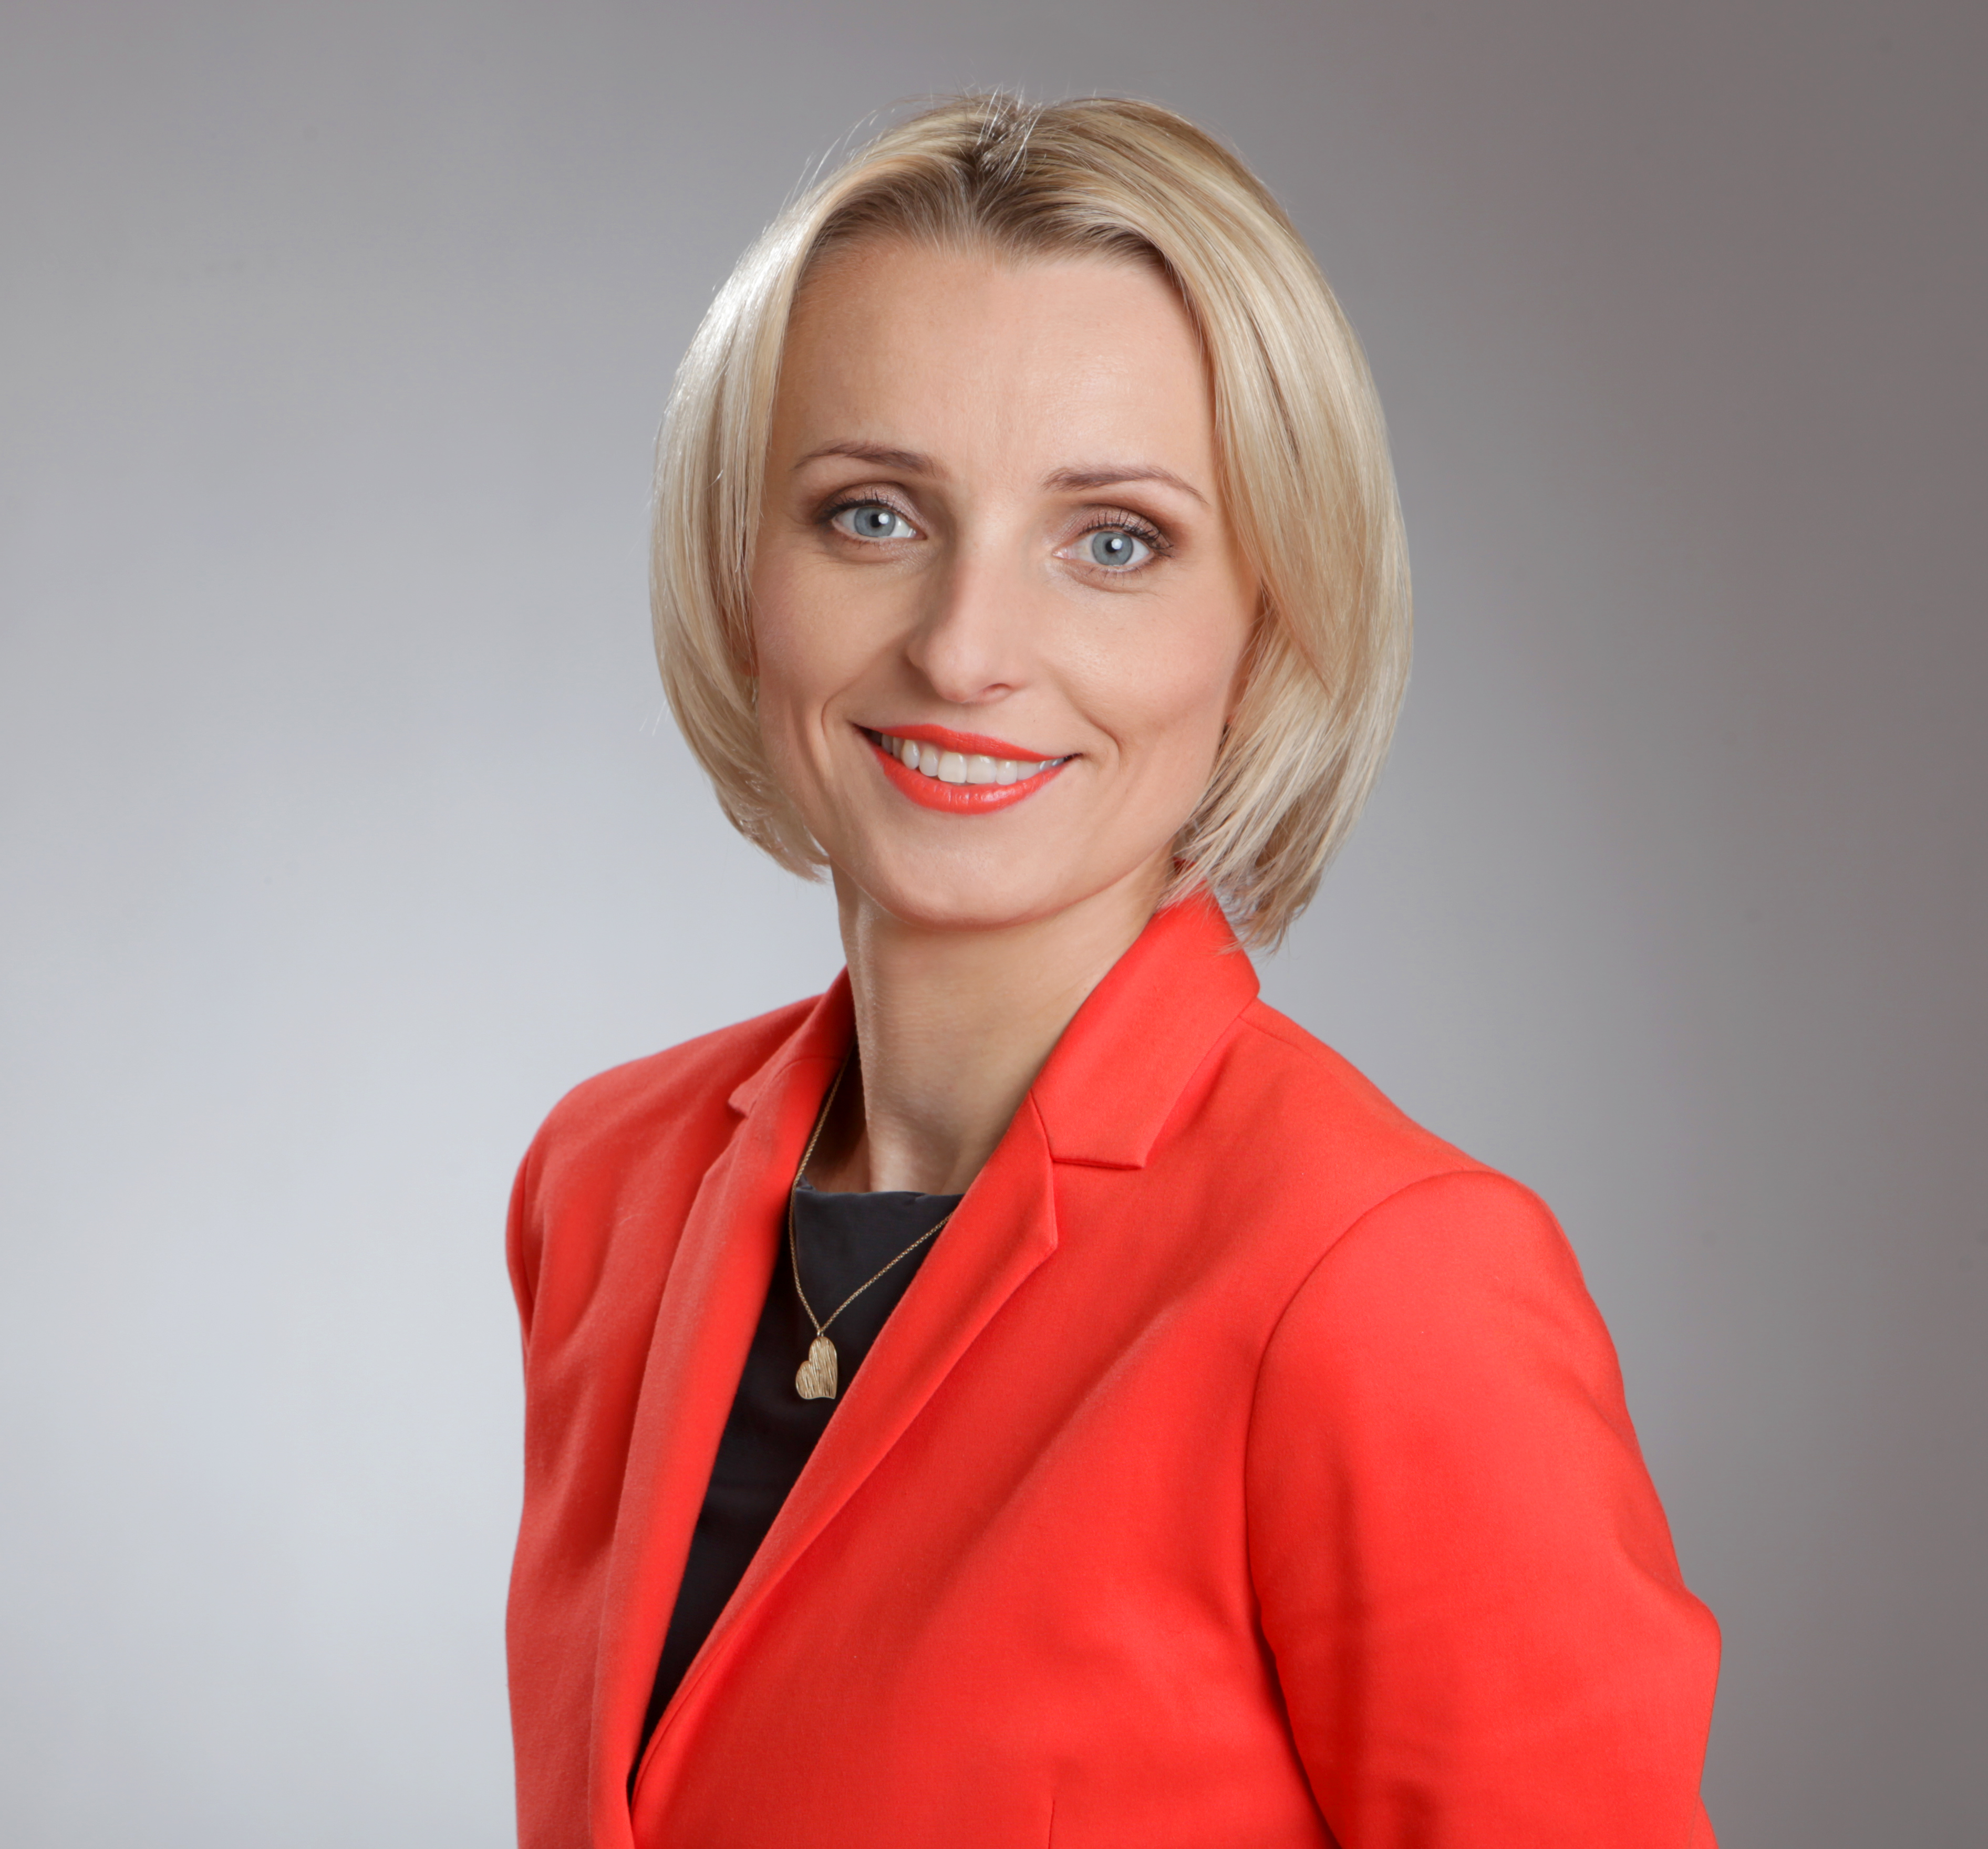 Joanna Seklecka